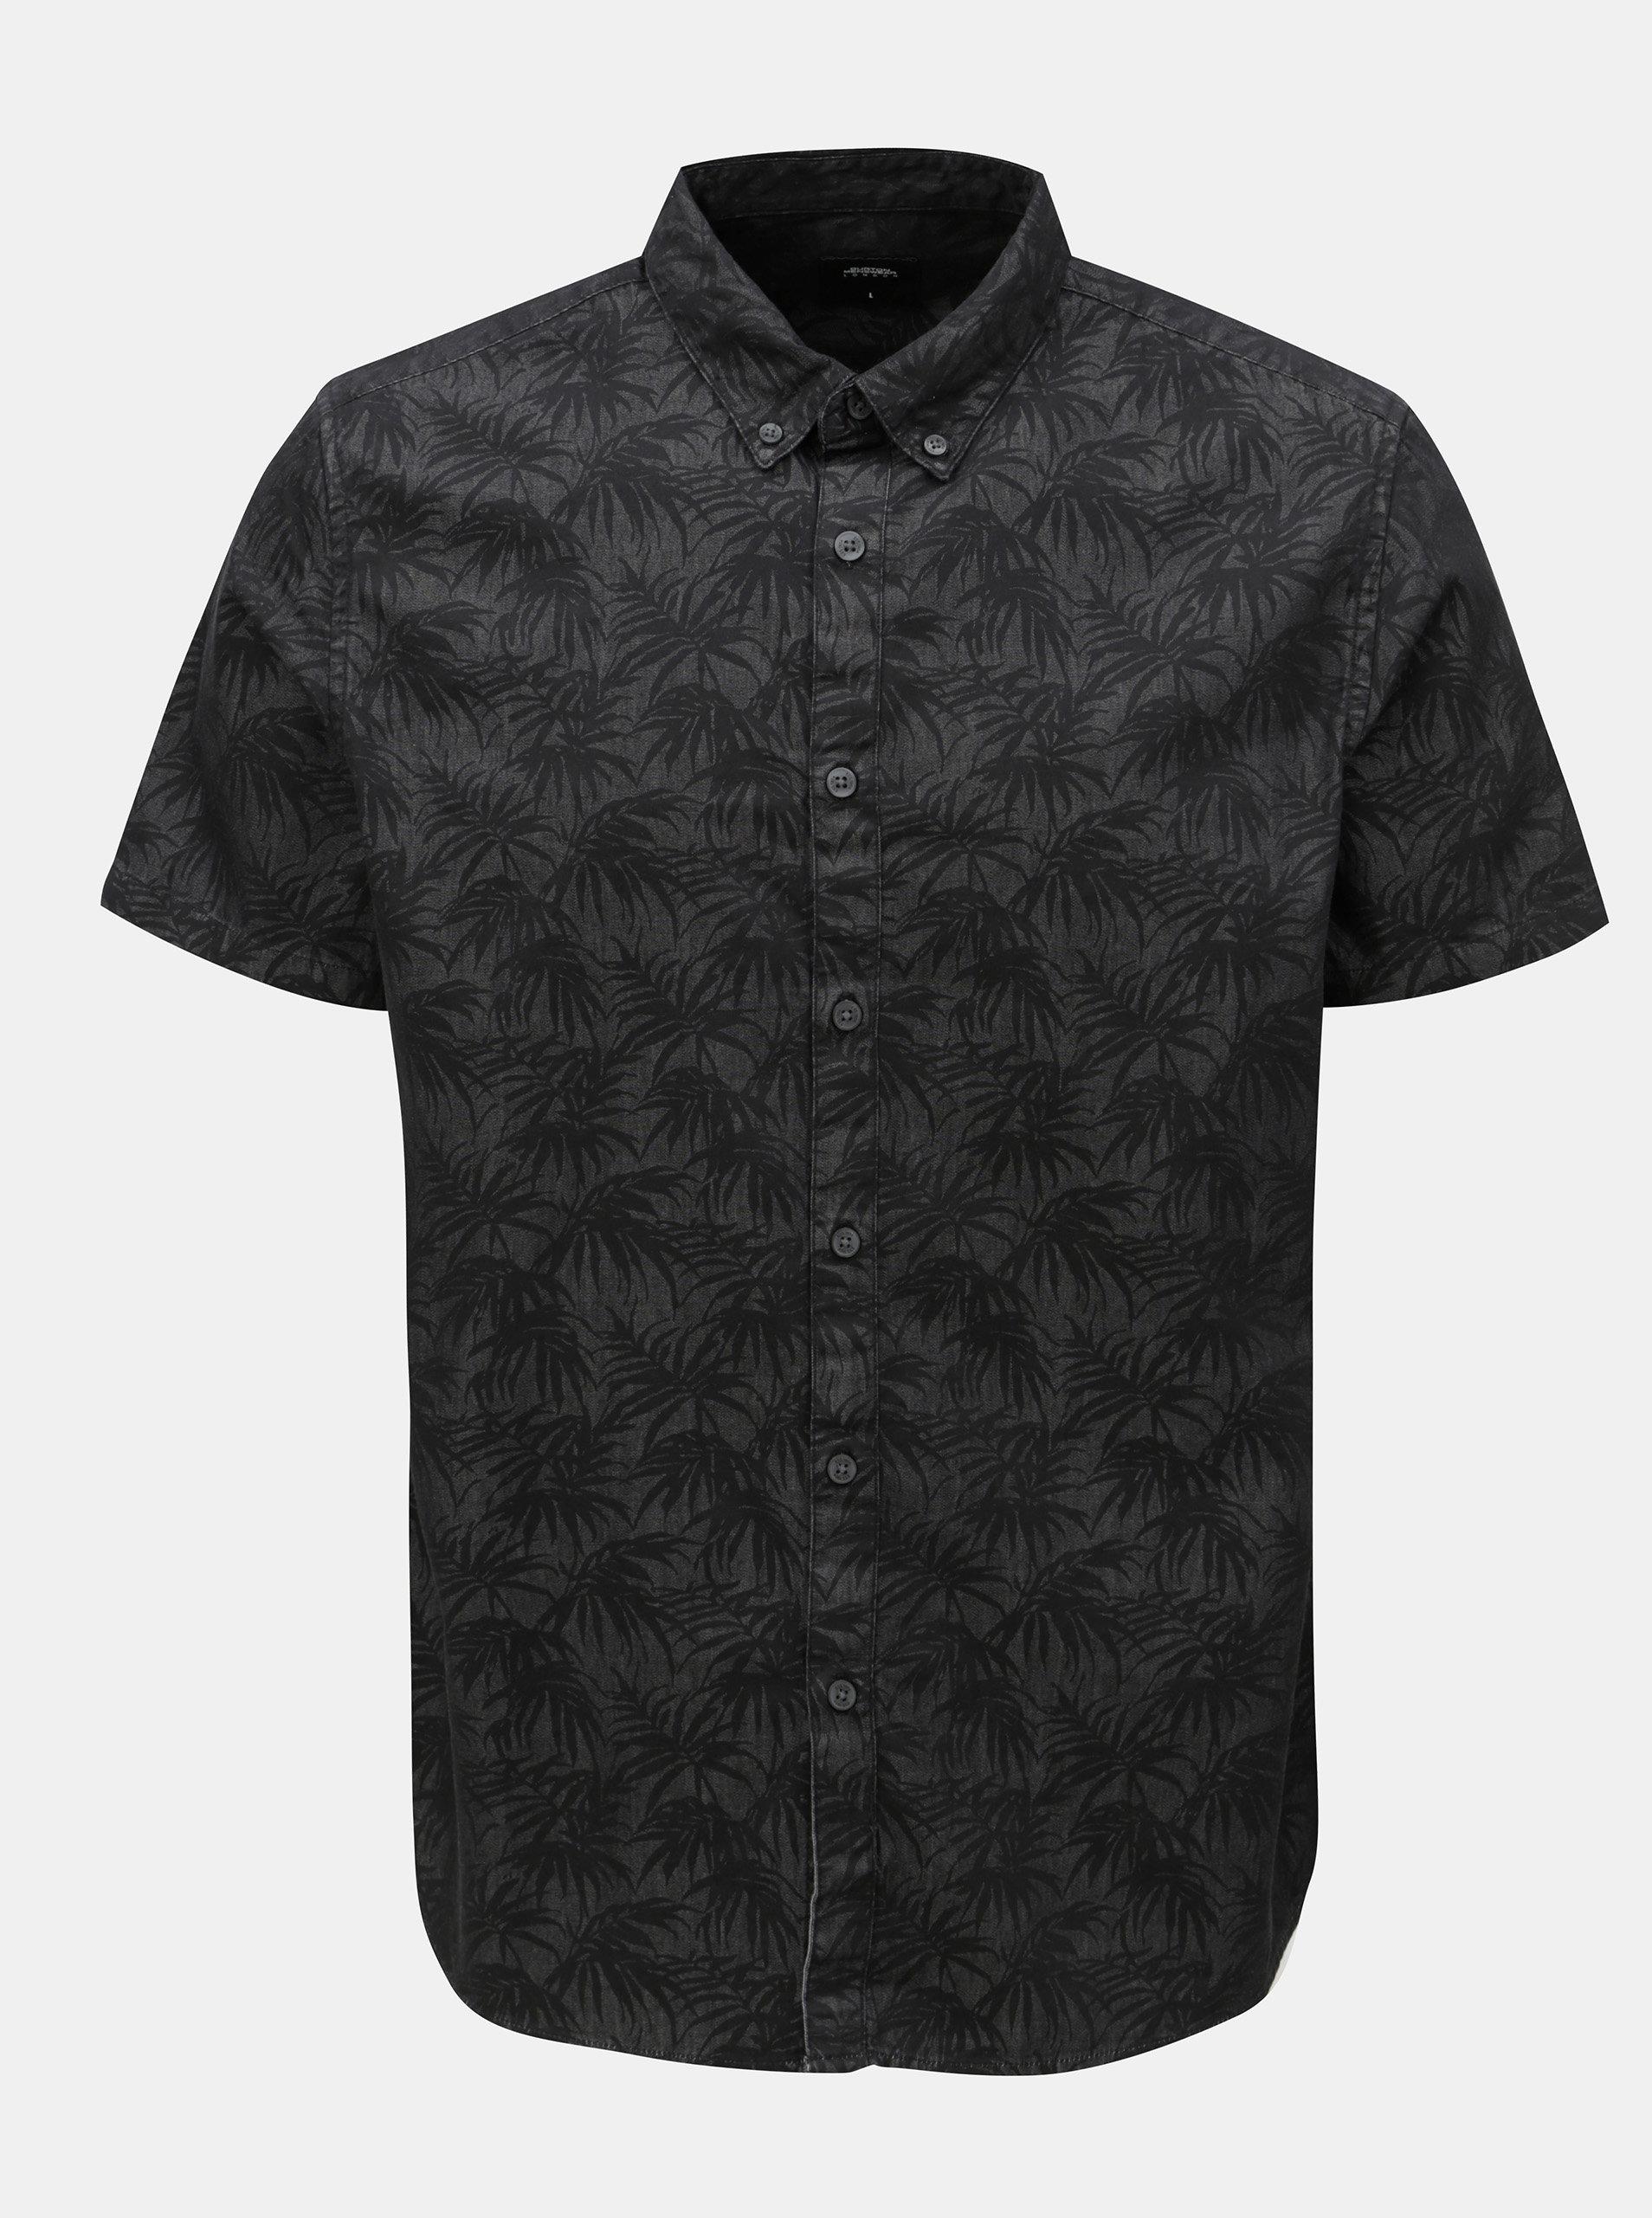 Tmavě šedá košile s motivem listů Burton Menswear London